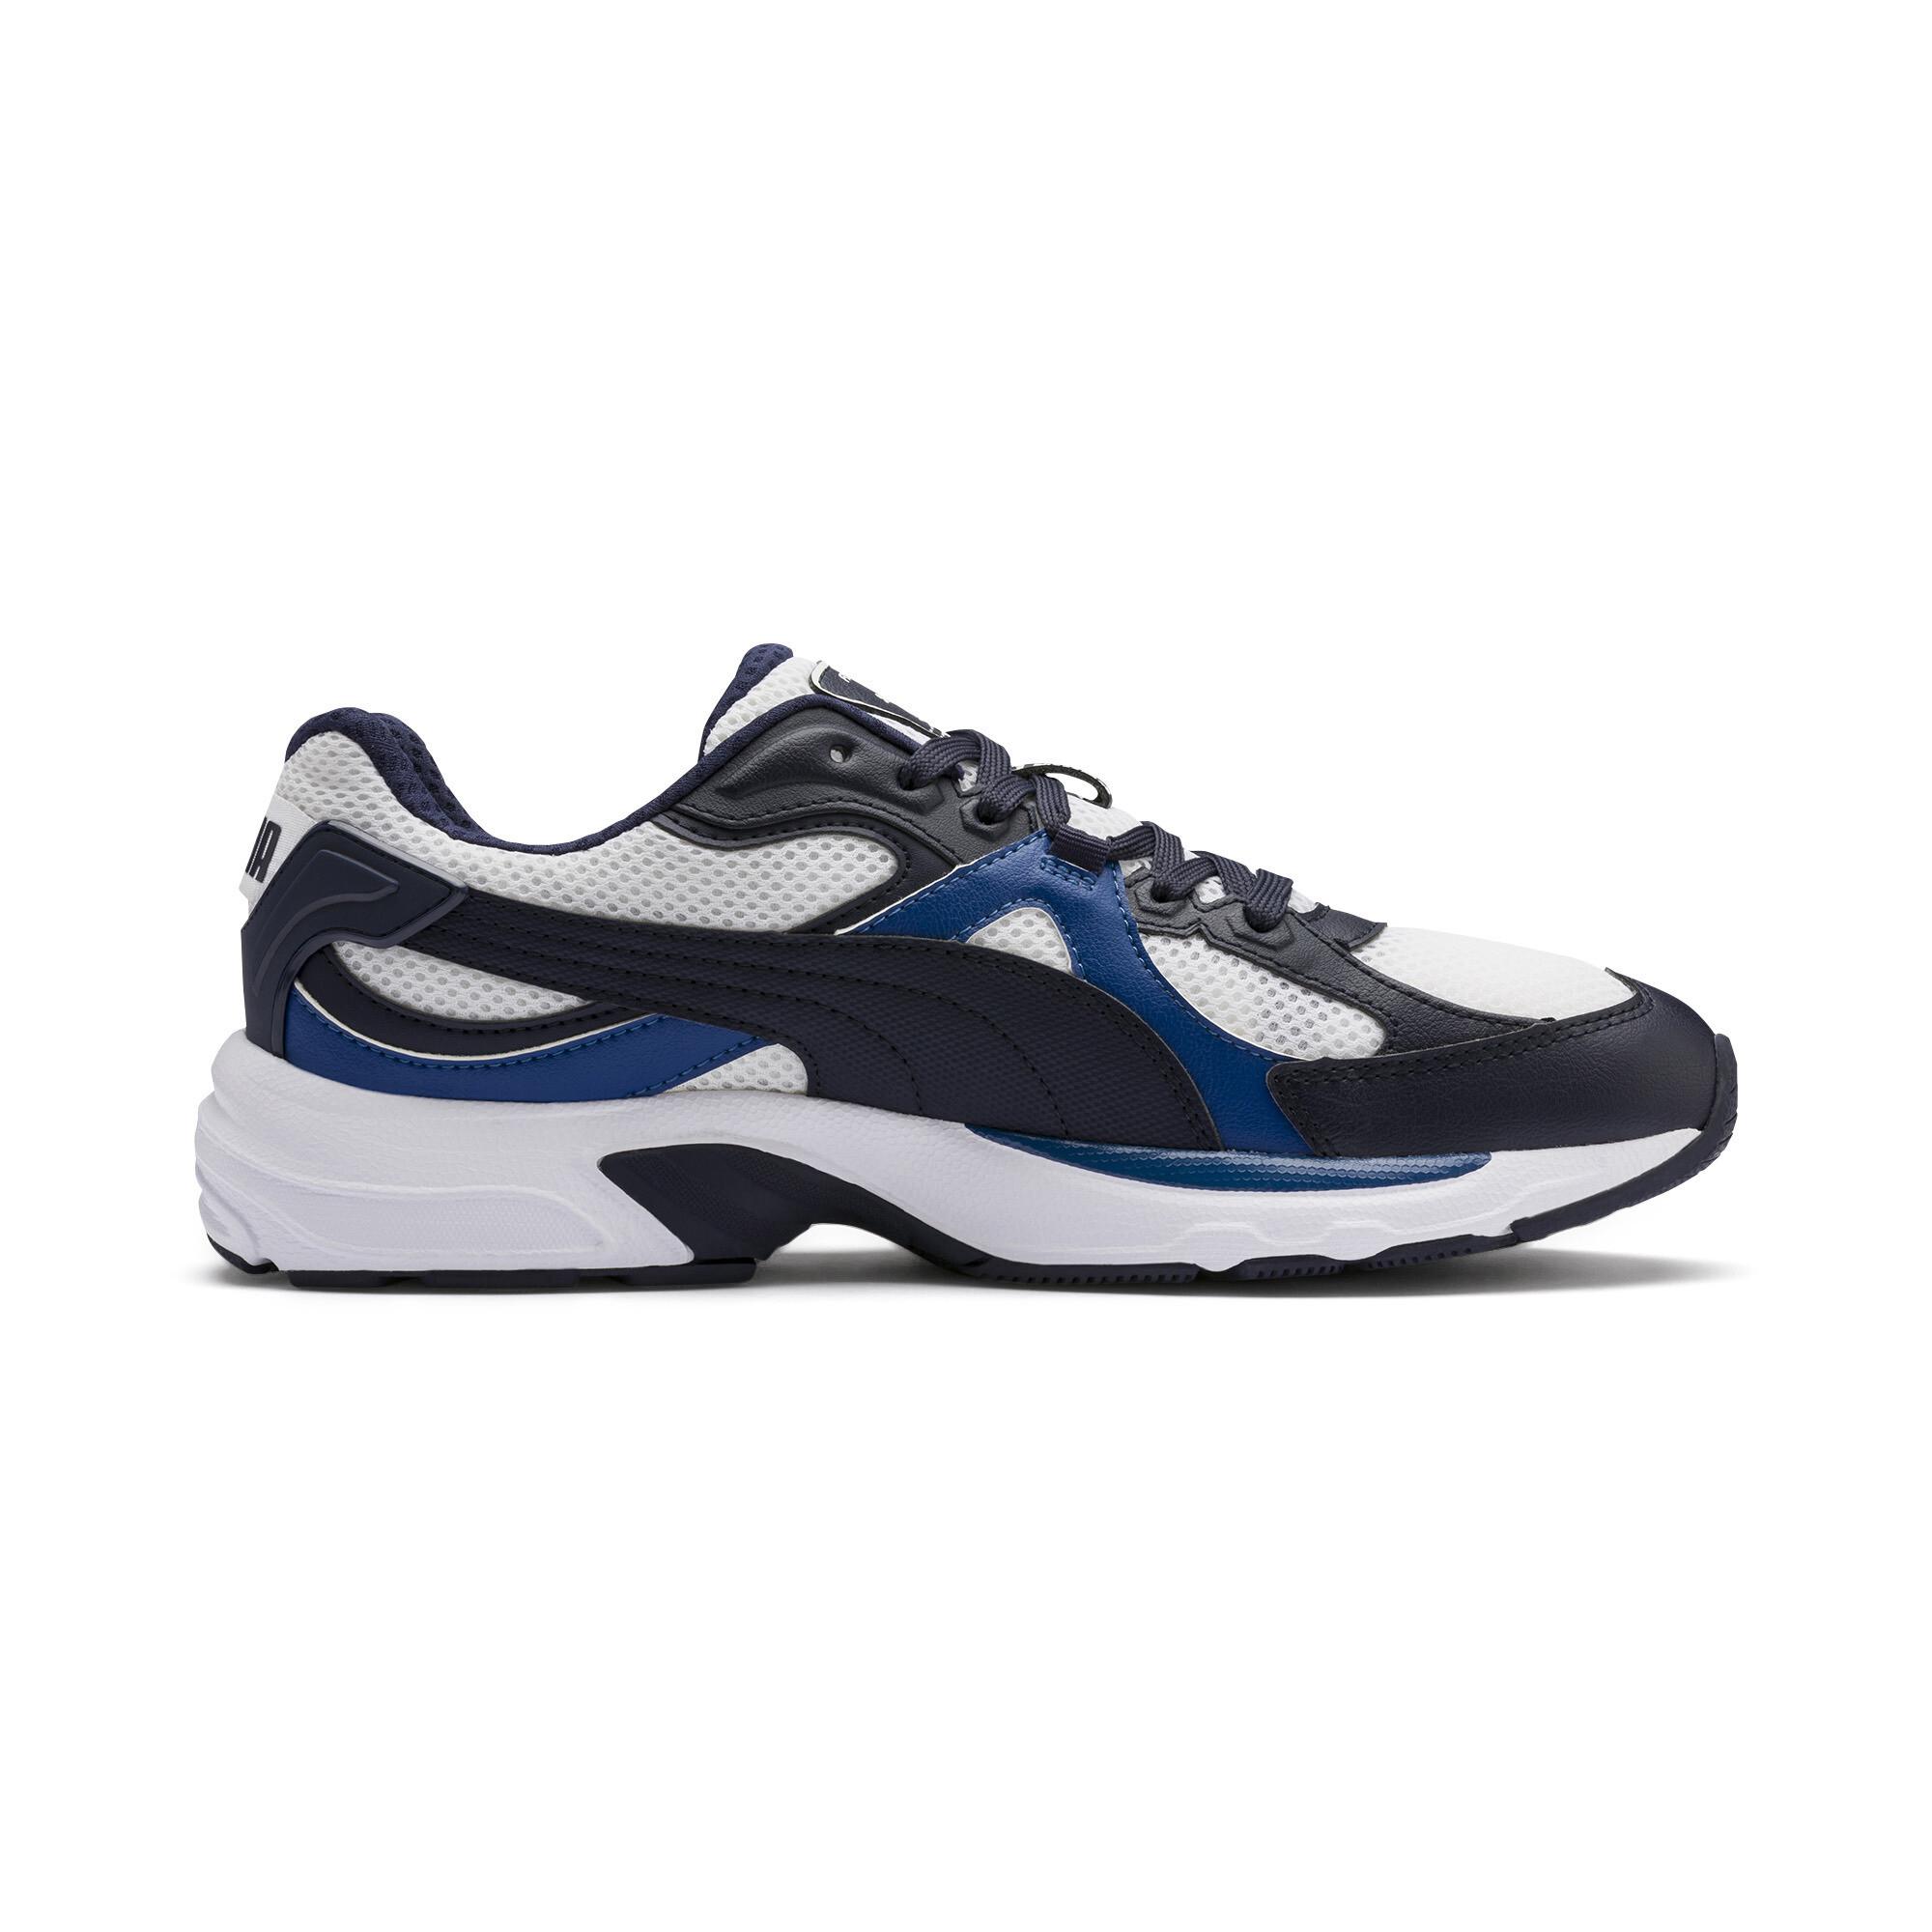 PUMA-Axis-Plus-90s-Sneakers-Men-Shoe-Basics thumbnail 27